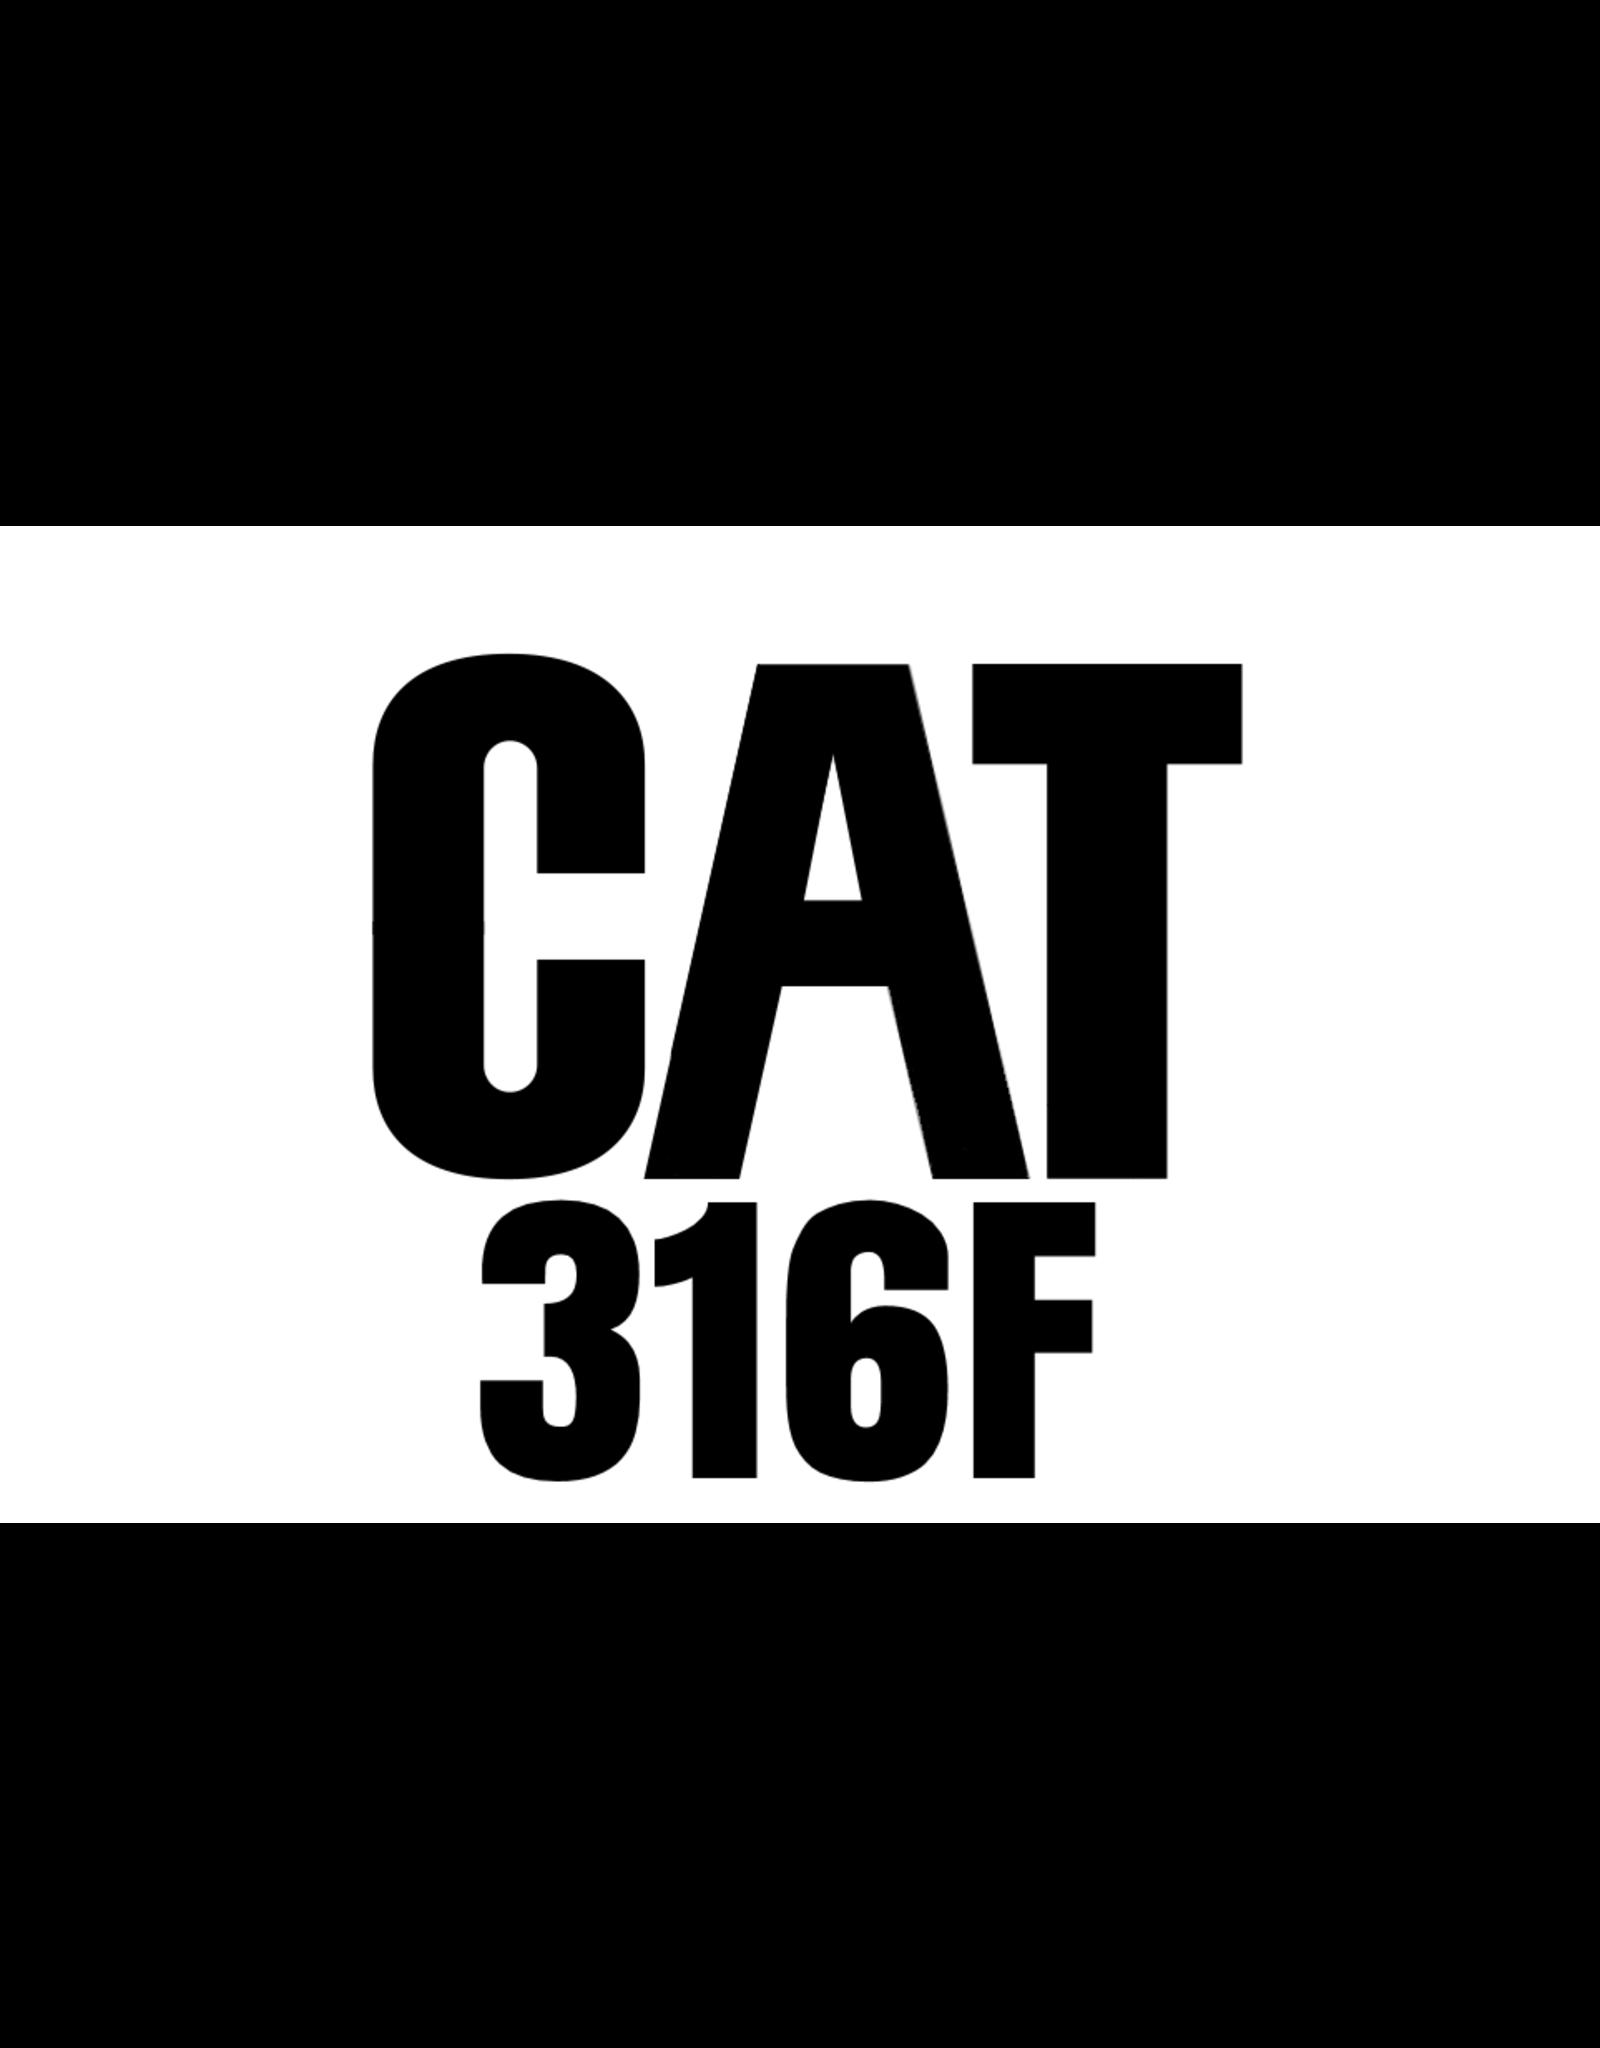 Echle Hartstahl GmbH FOPS for CAT 316F